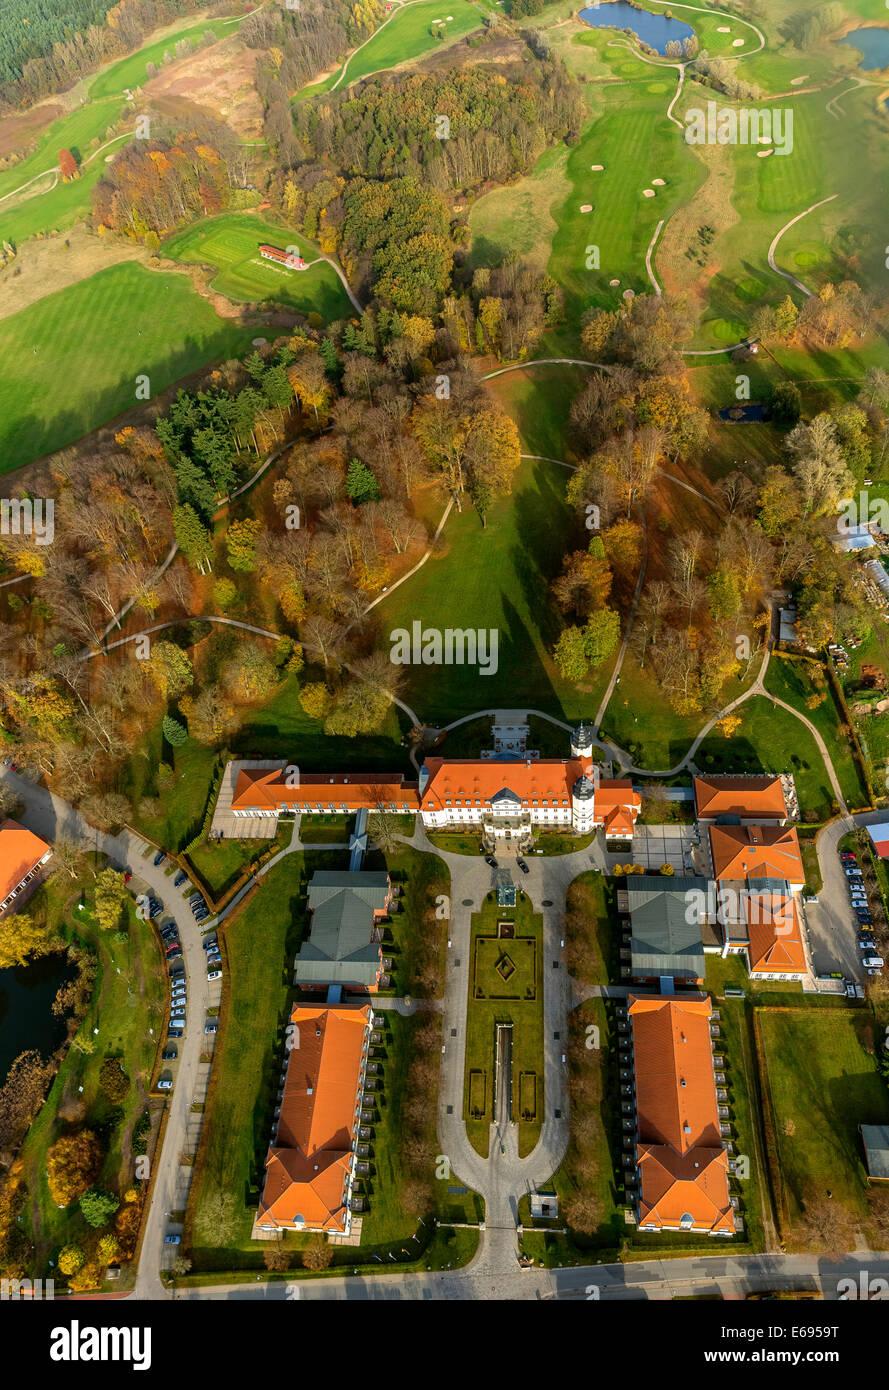 Aerial view, Radisson Blu Resort Schloss Fleesensee, Scandinavian Golf Club in Göhren-Lebbin, Müritz lake - Stock Image